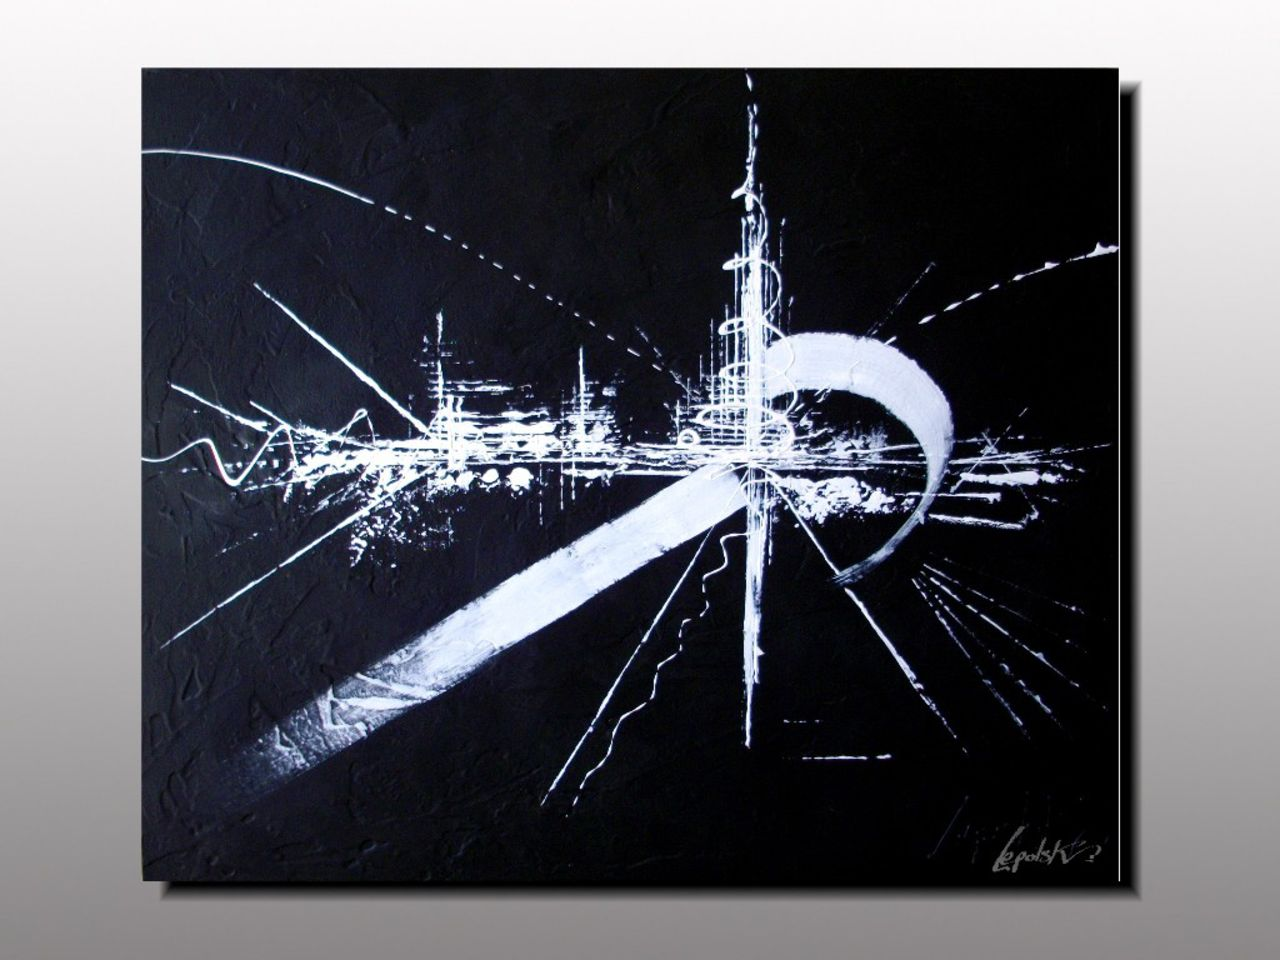 LEPOLSK MATUSZEWSKI ARCHETYPE   Dripping Art abstrait